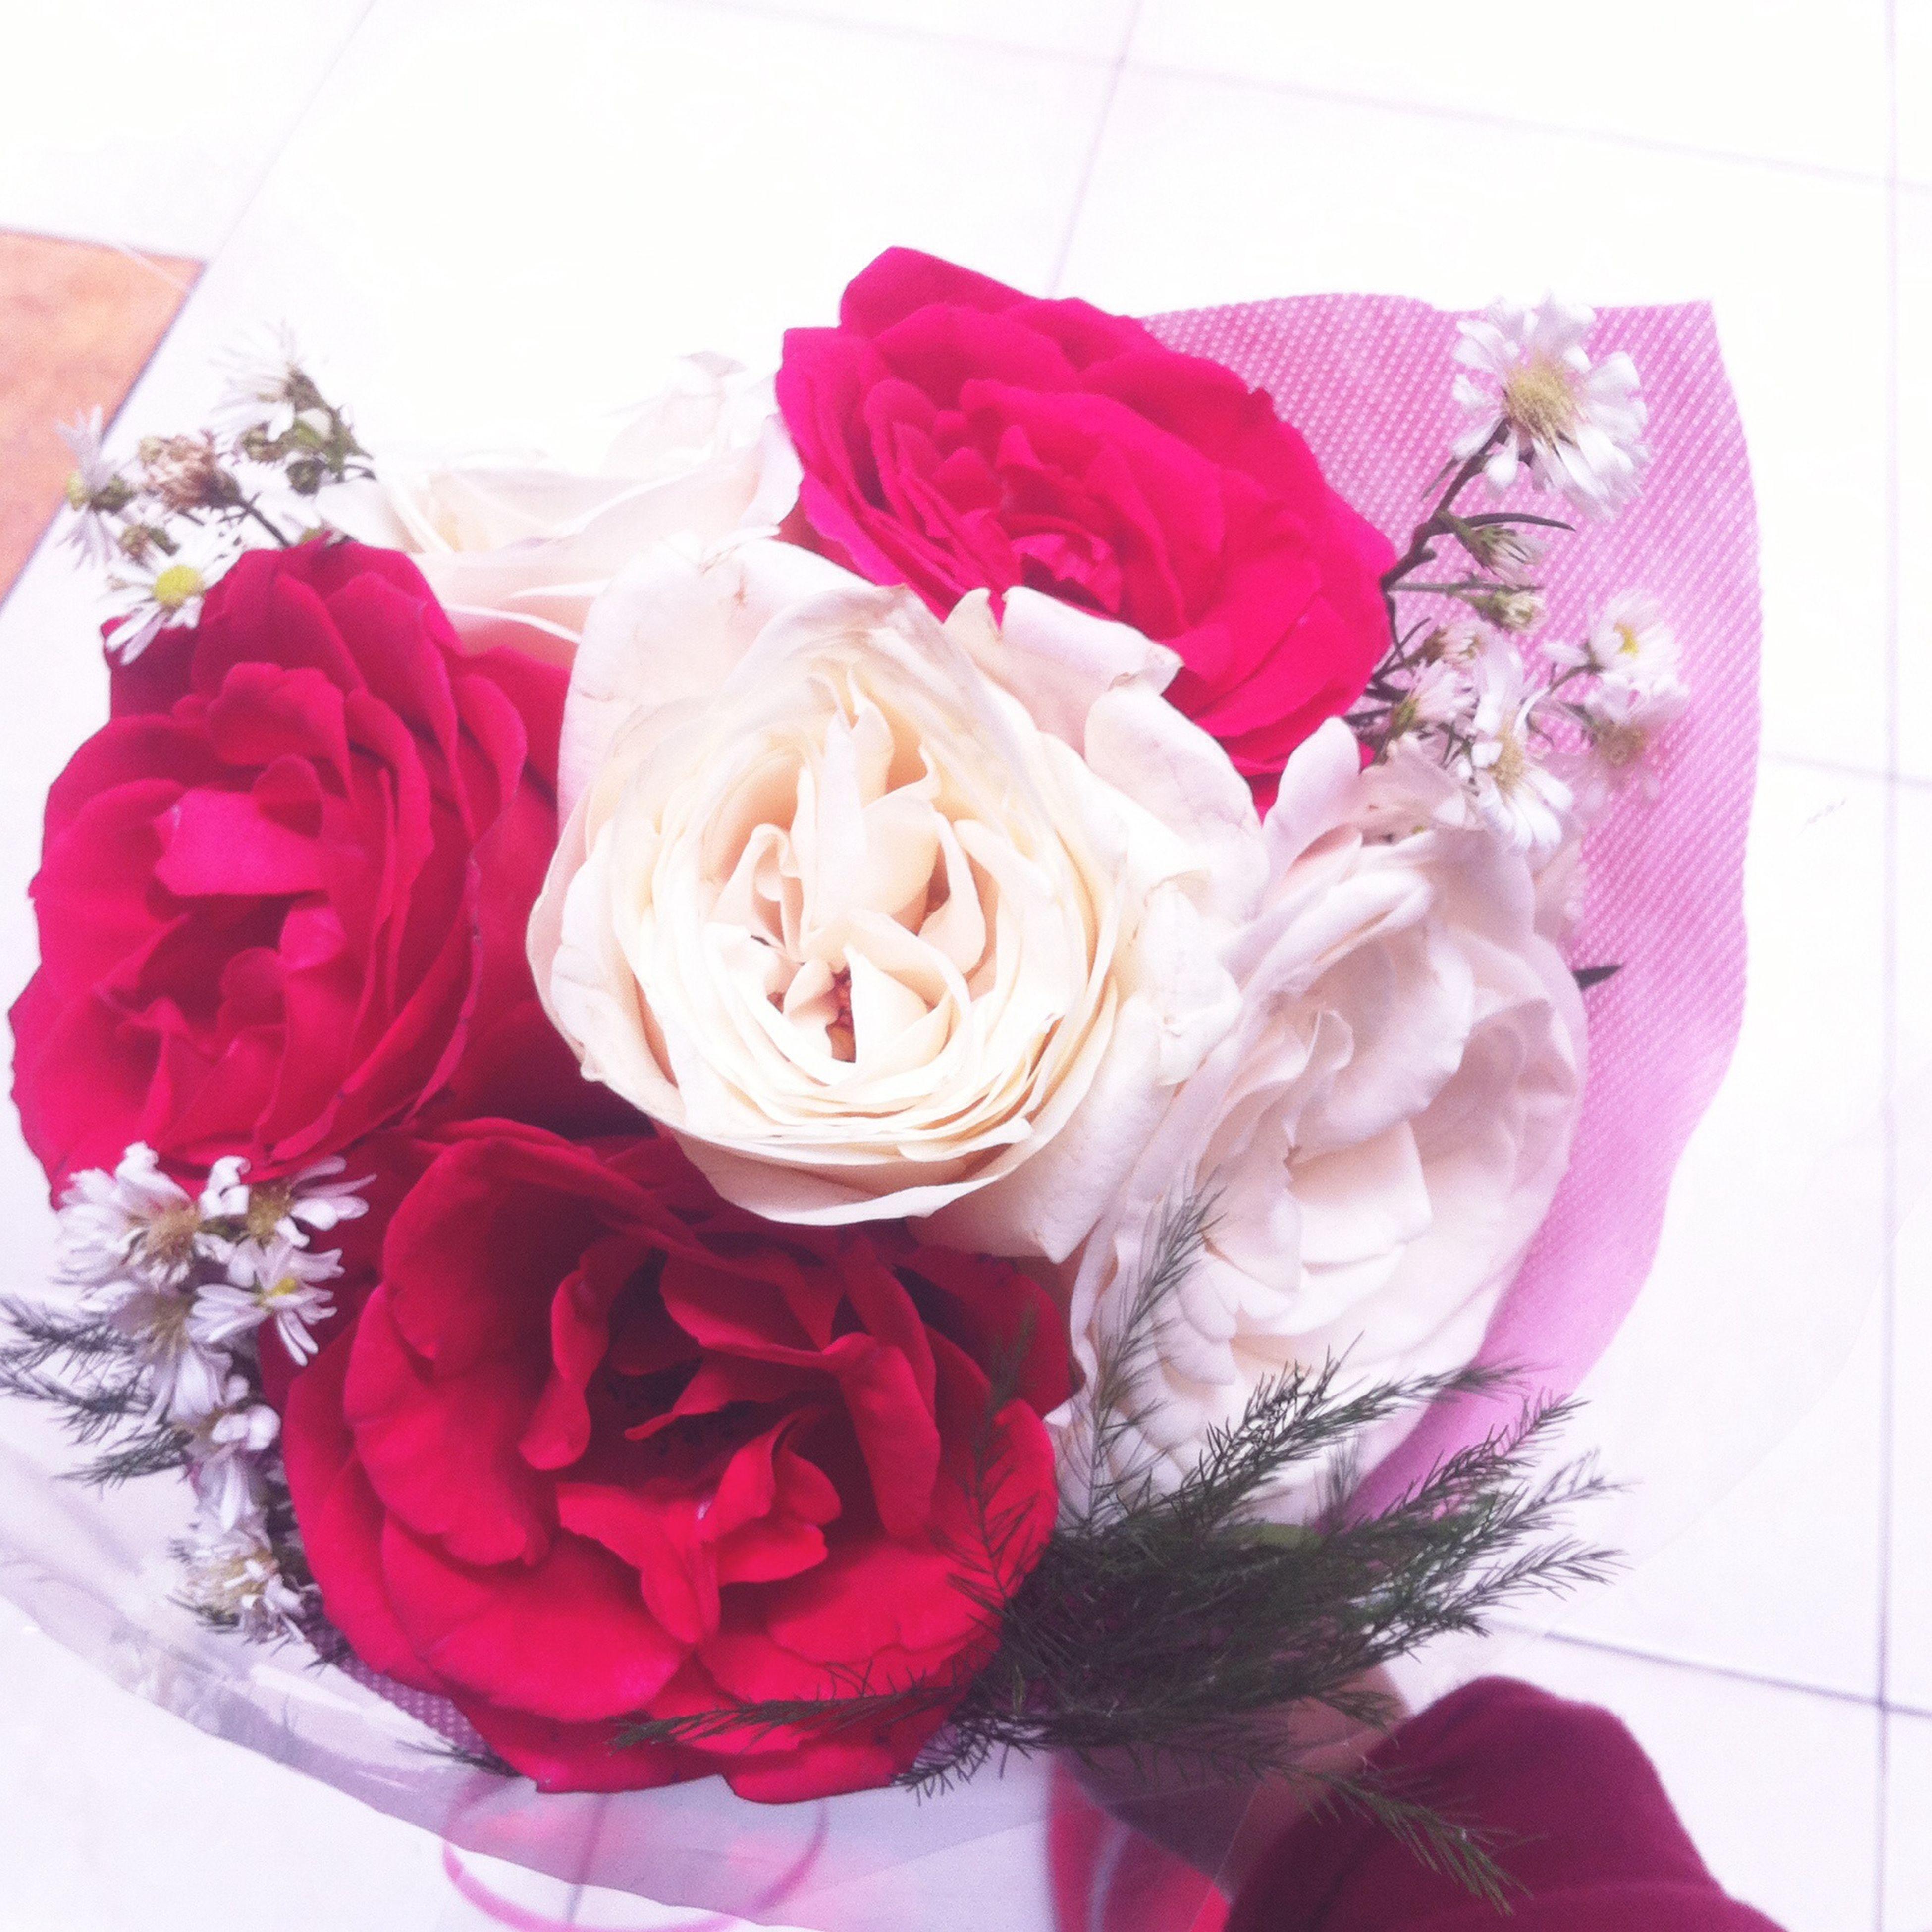 flower, indoors, rose - flower, petal, freshness, bouquet, red, fragility, decoration, vase, pink color, flower head, white background, close-up, rose, bunch of flowers, wall - building feature, flower arrangement, studio shot, home interior